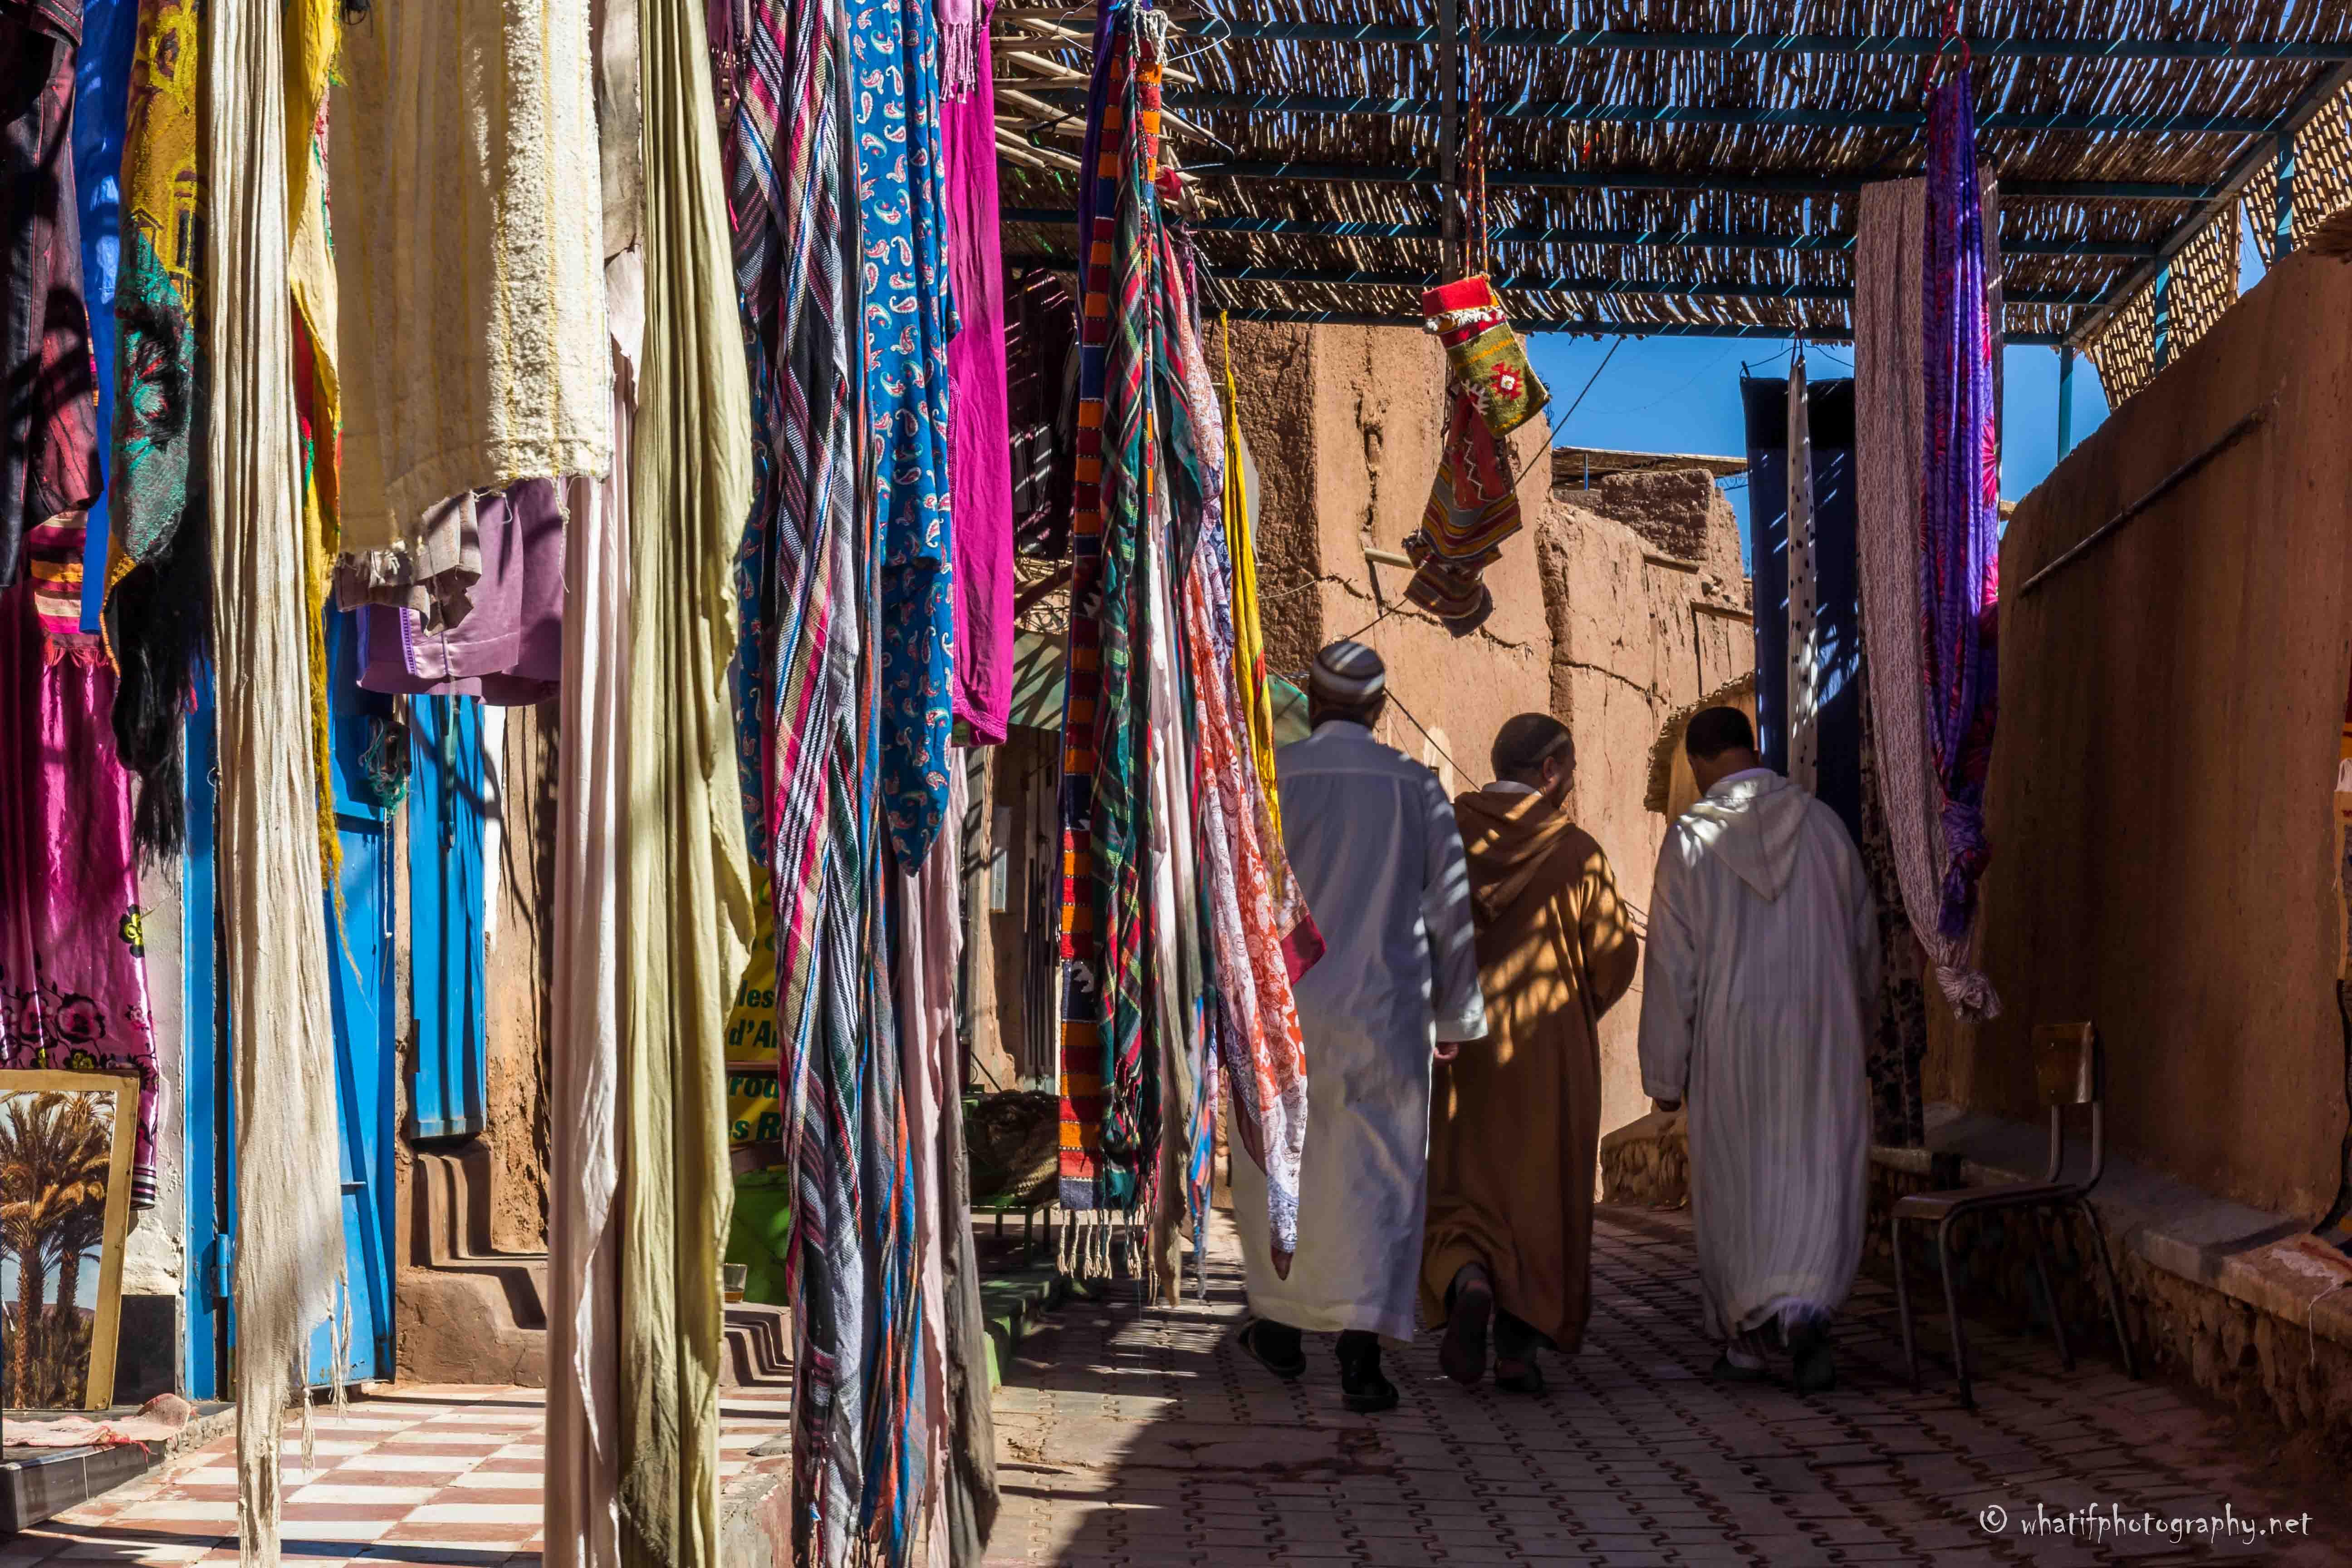 Scarf shop in Ouarzate